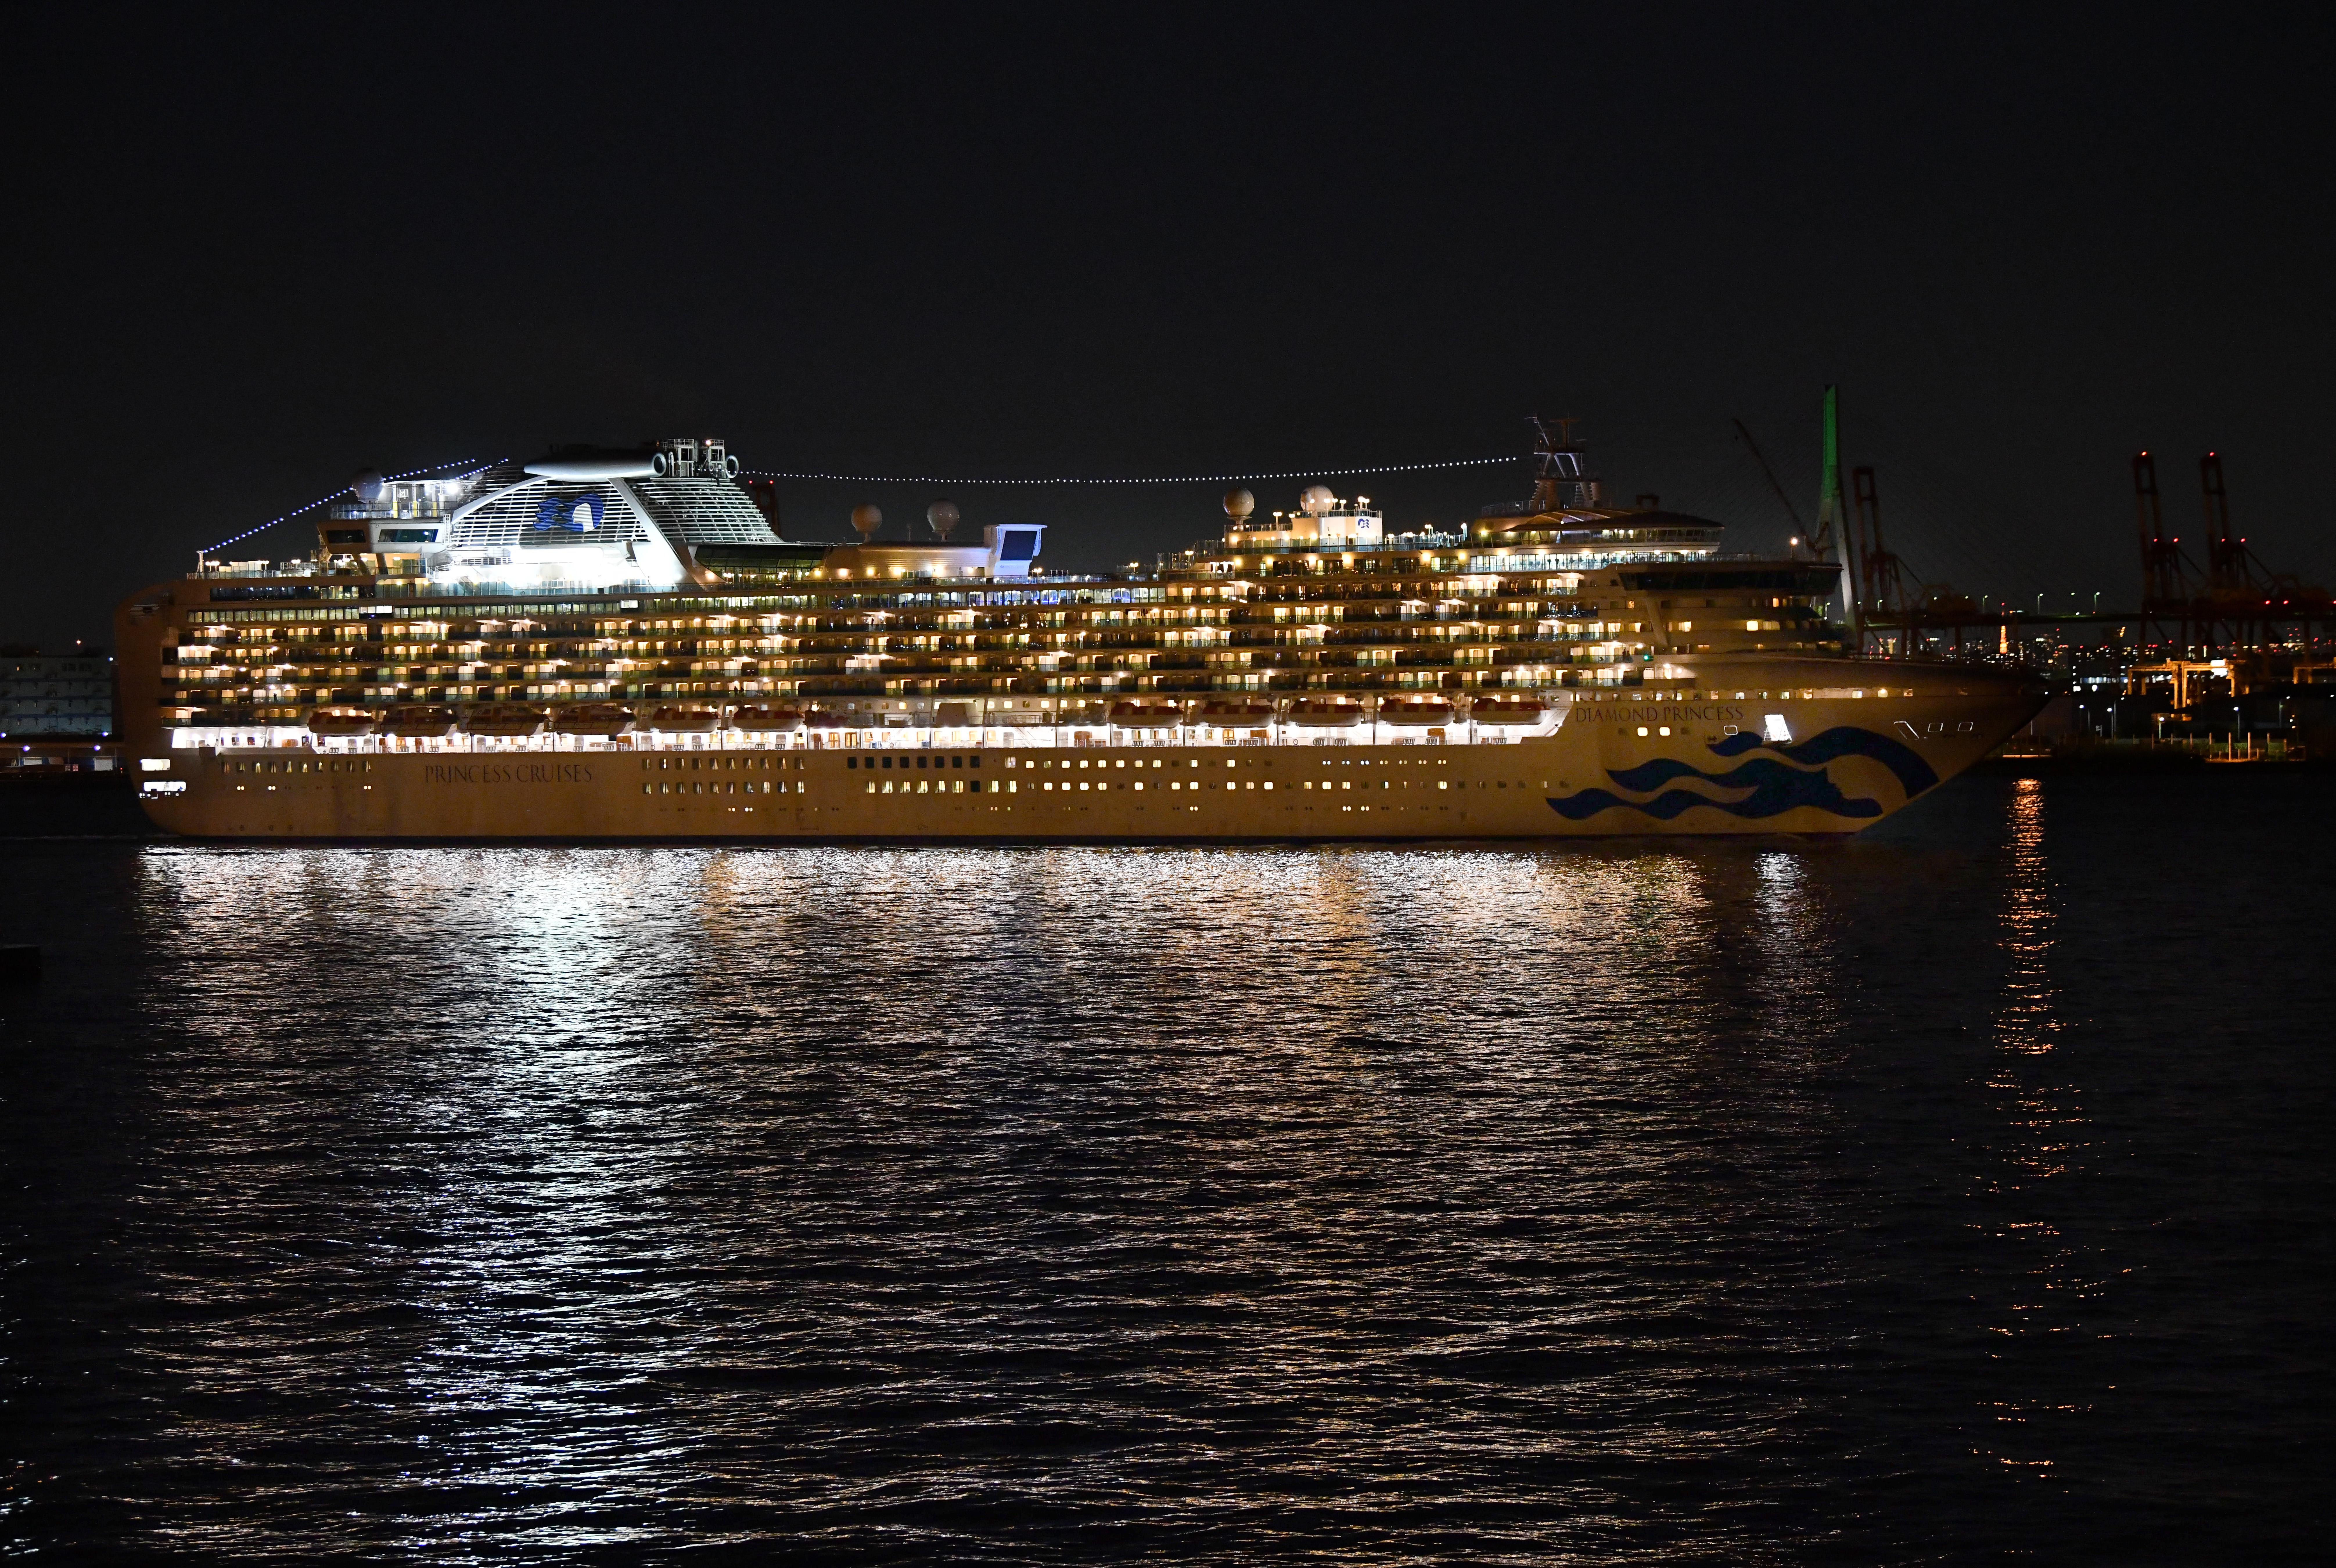 The coronavirus cruise ship quarantine is a scary public health experiment